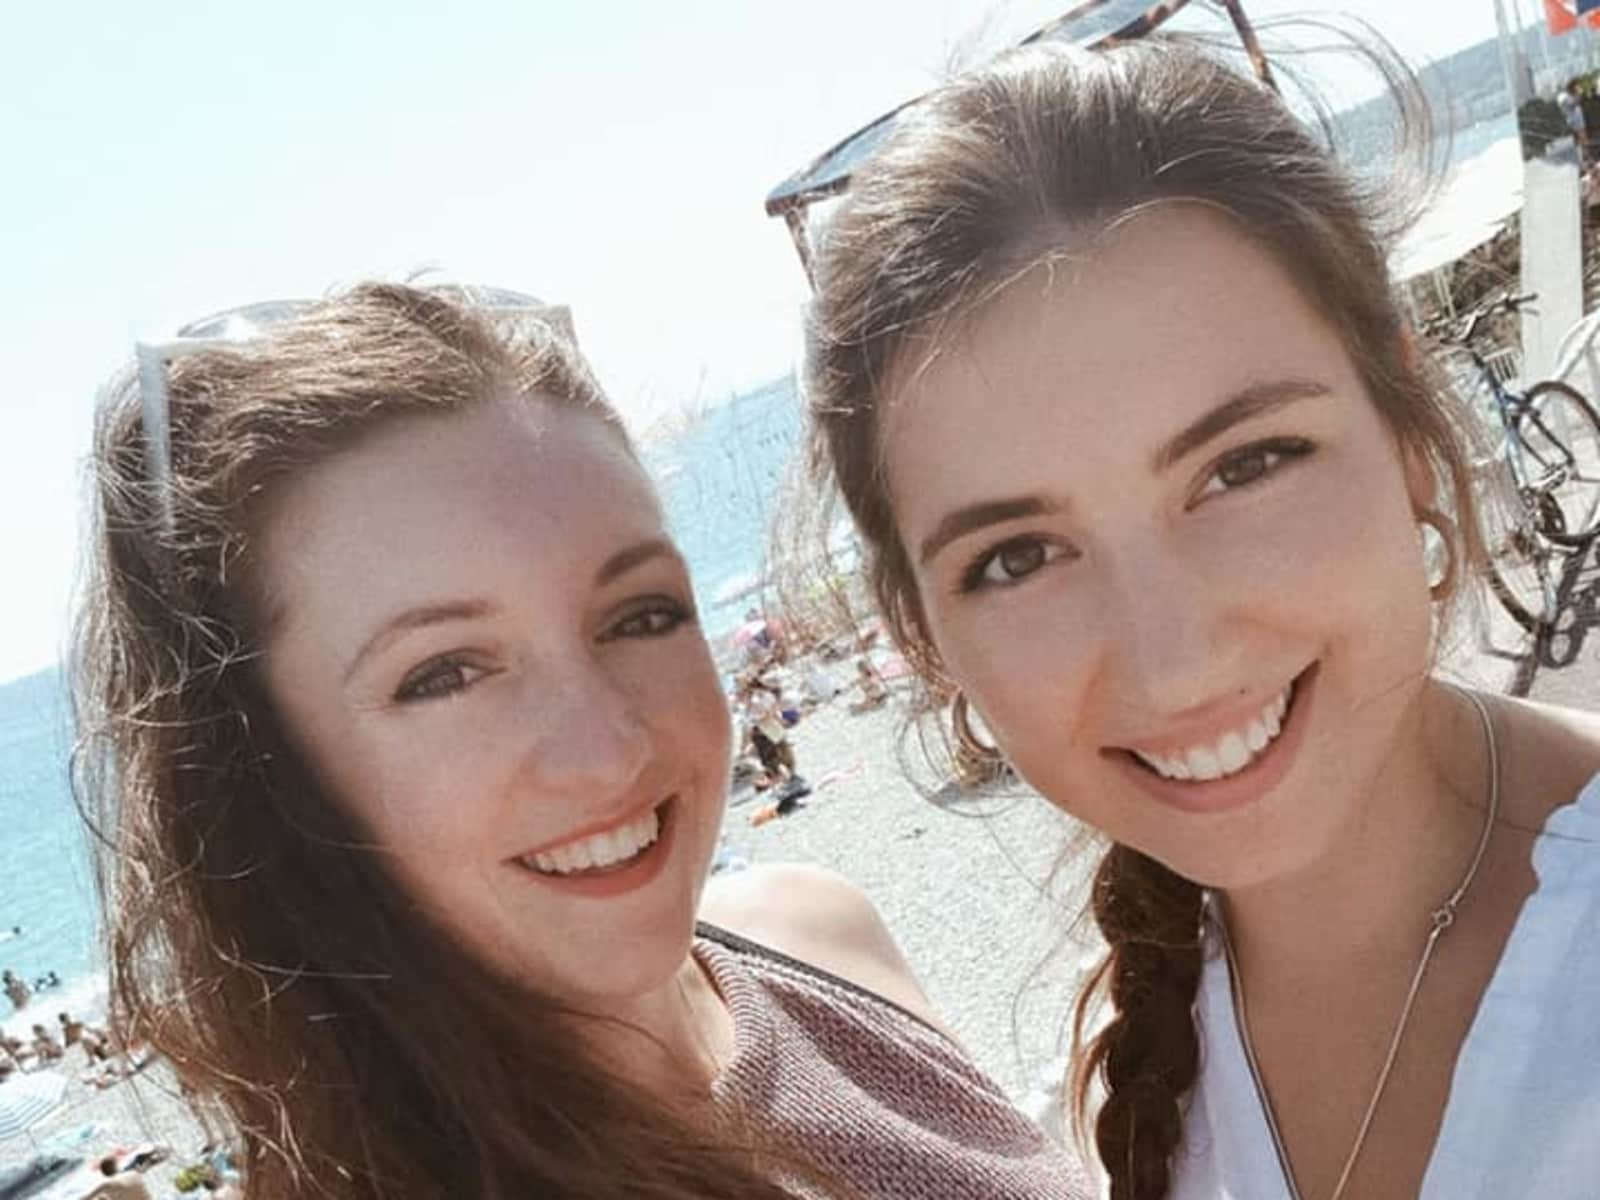 Anaïs & Christine from Valbonne, France